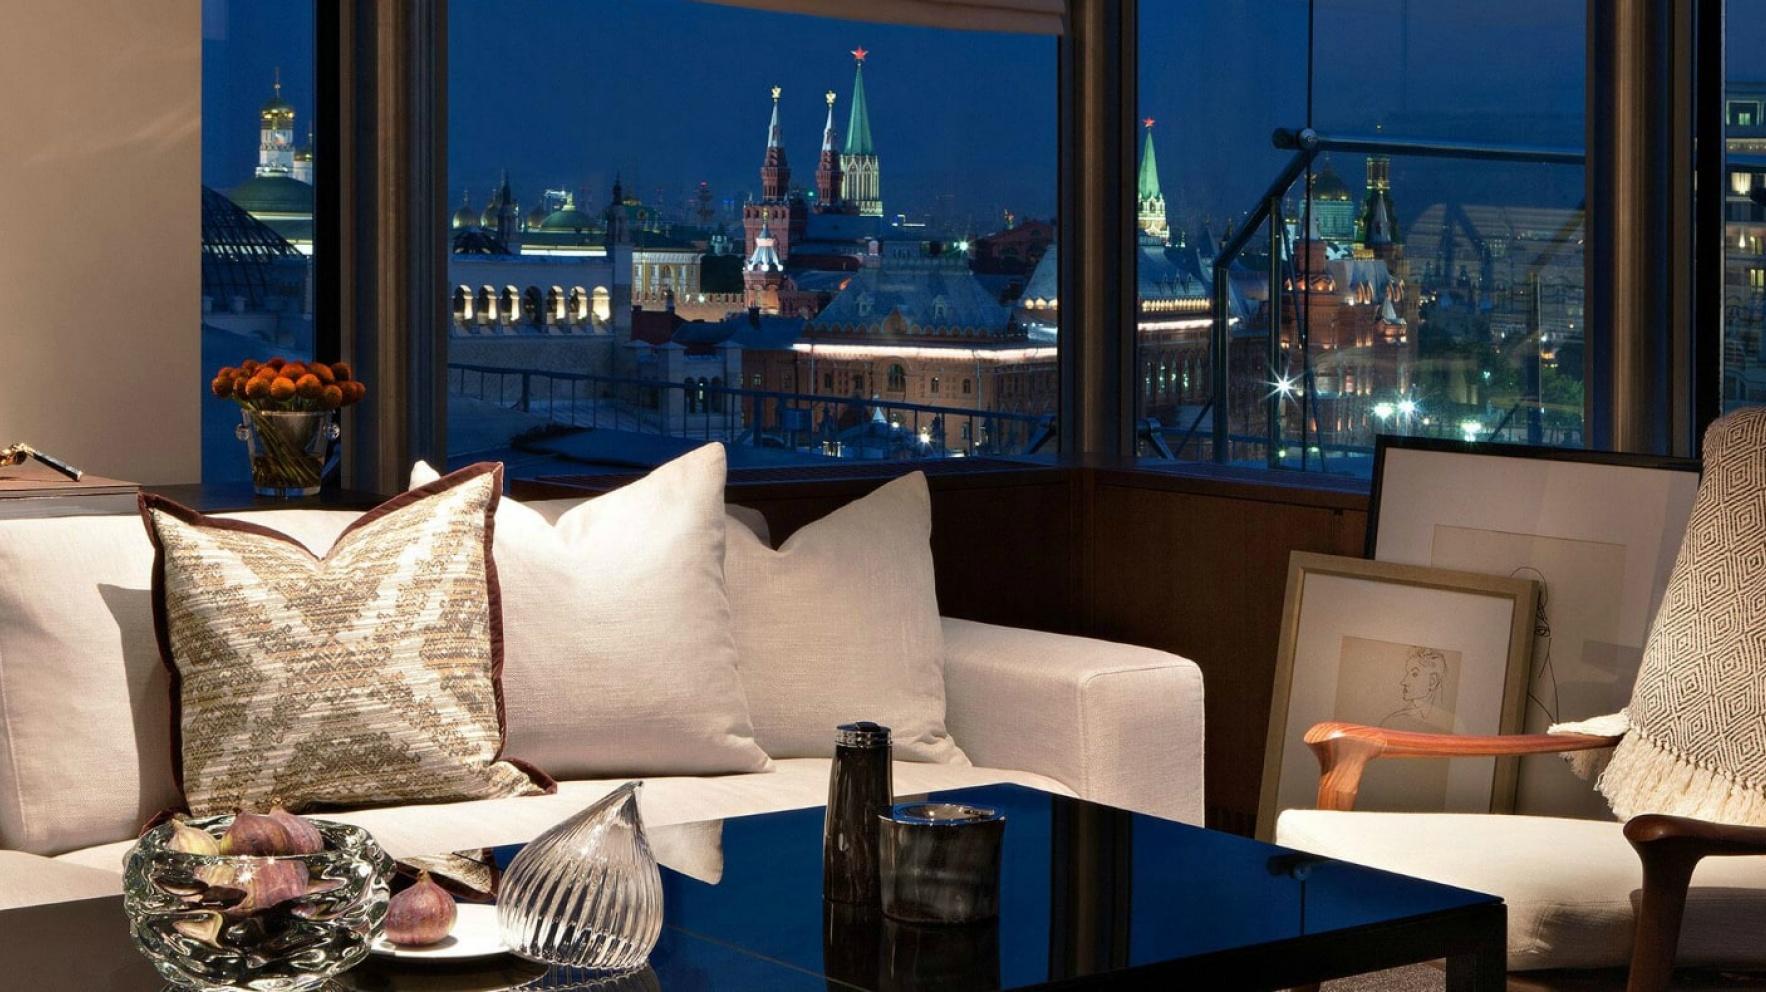 Best Hotels in Russia